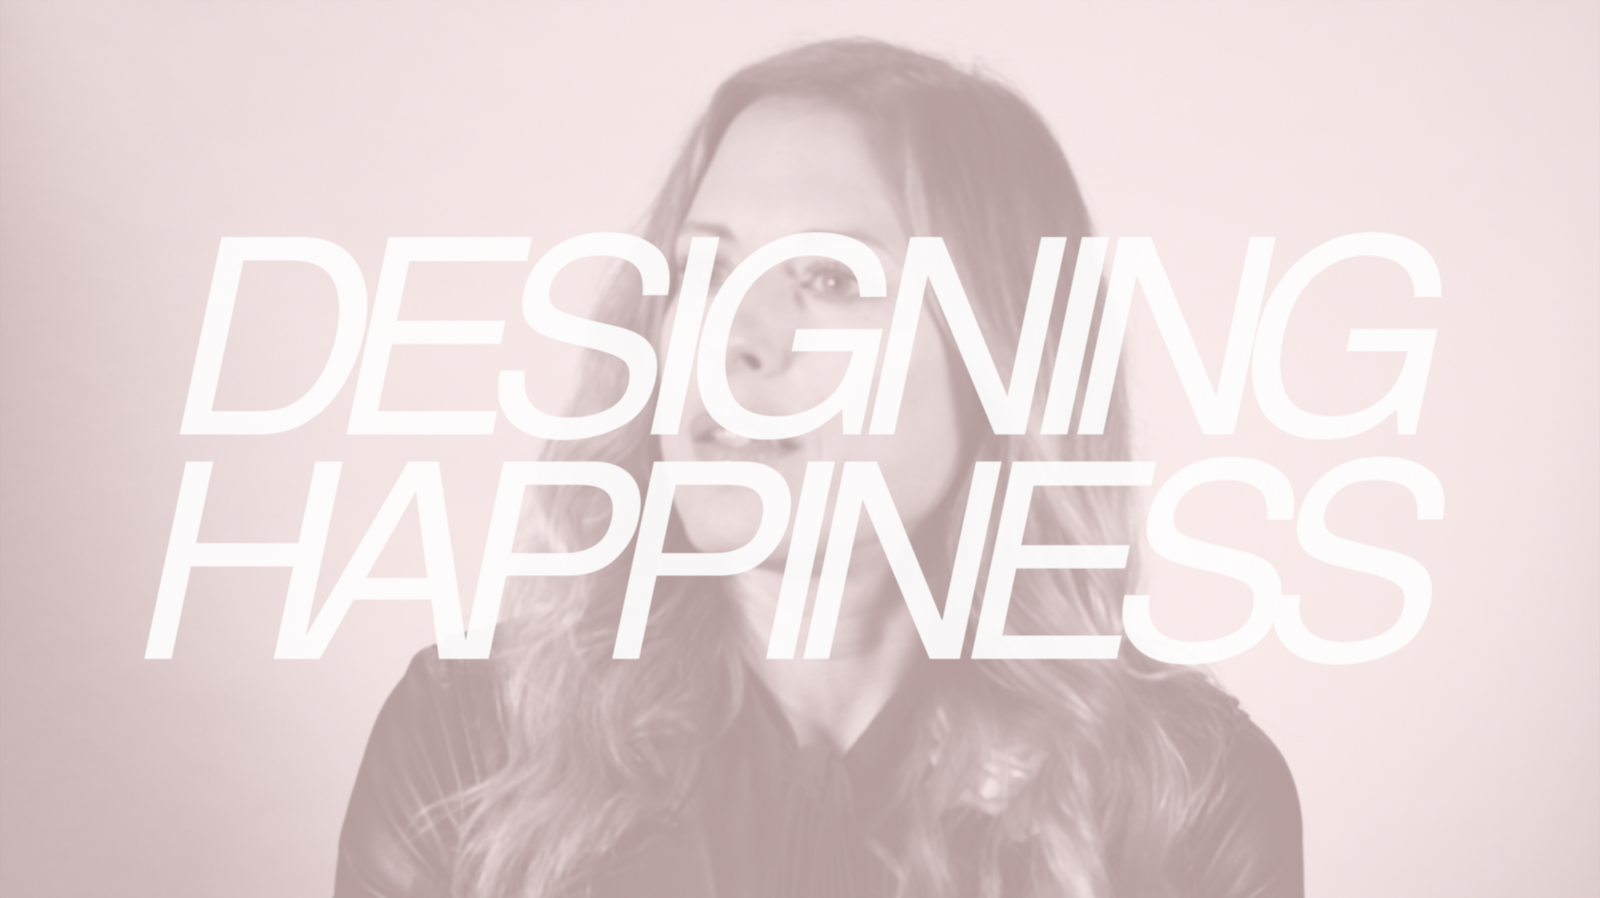 Designing Happiness // Nika Zupanc - Photo 1 of 1